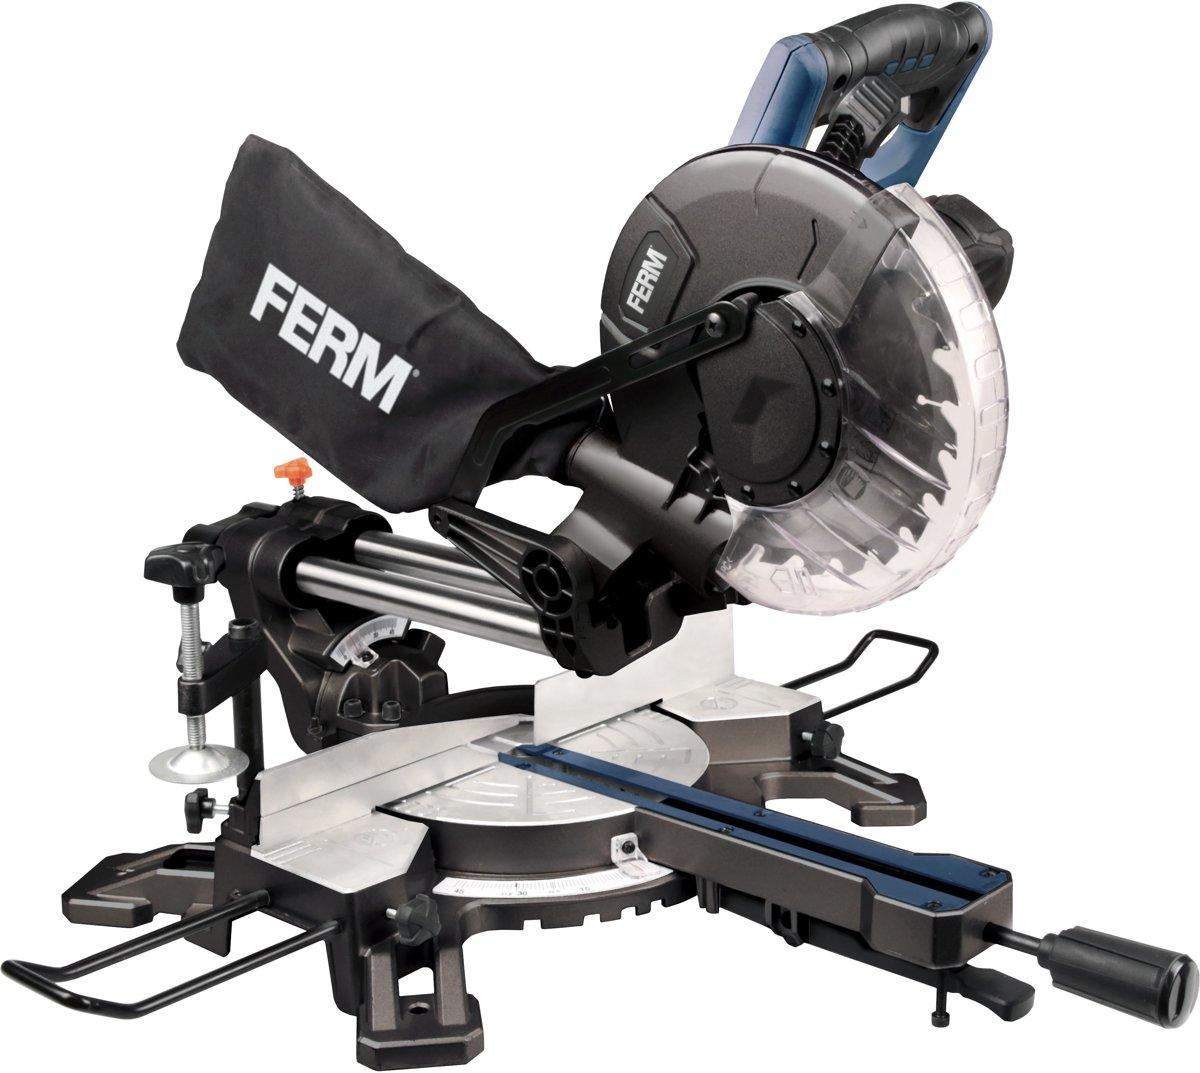 FERM Radiaal afkortzaag 1500W, Ø210mm - kantelbaar, lasergeleiding